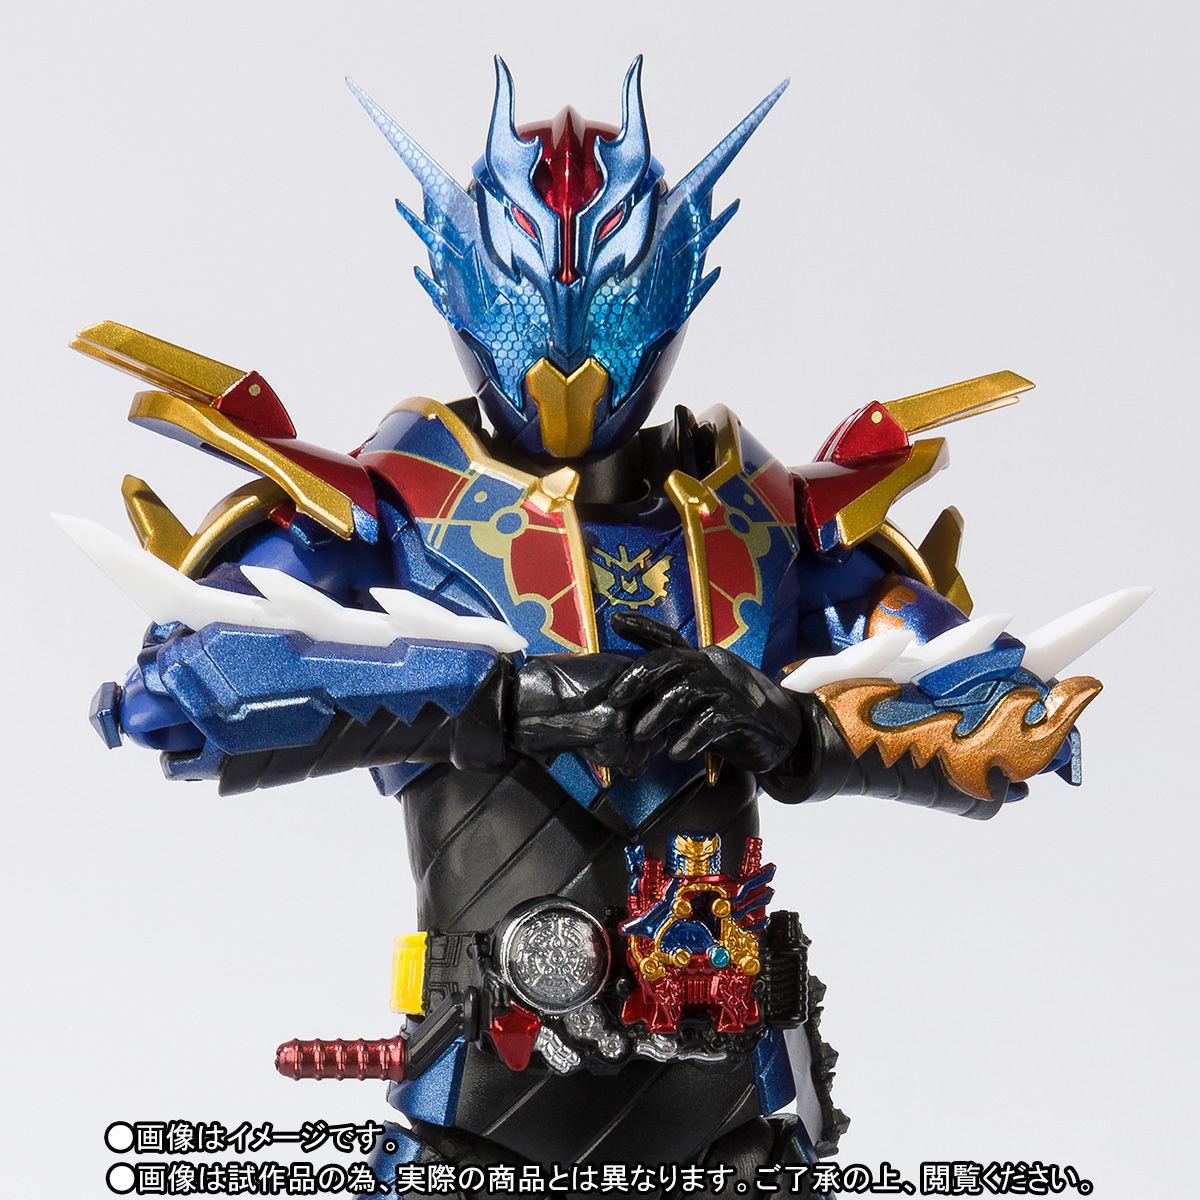 S.H.フィギュアーツ『仮面ライダーグレートクローズ』可動フィギュア-001